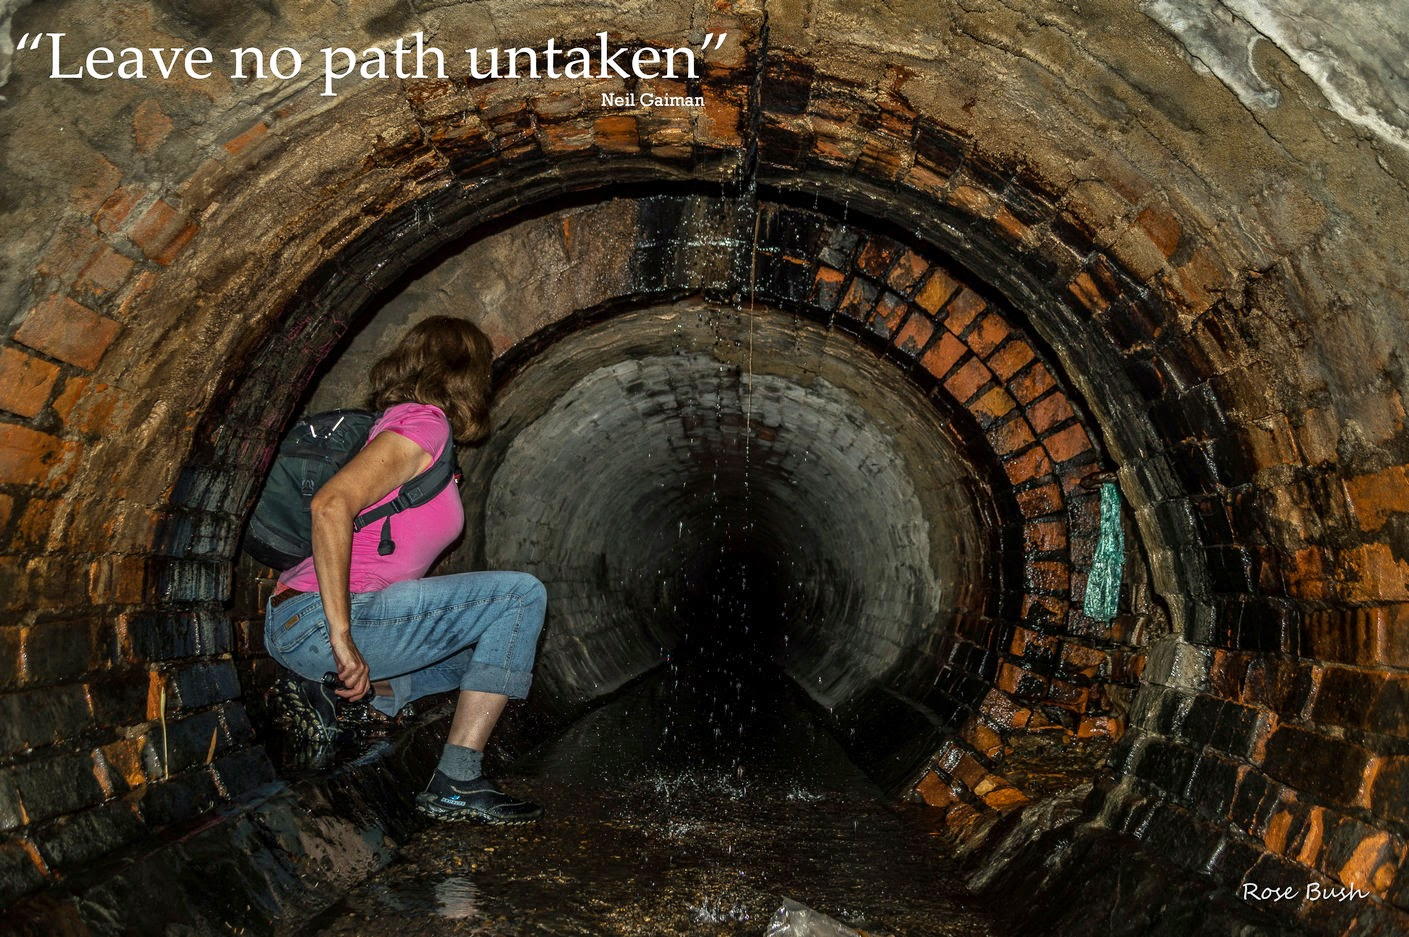 Brisbane Urbex Rose Bush Brick Storm Drain Underground